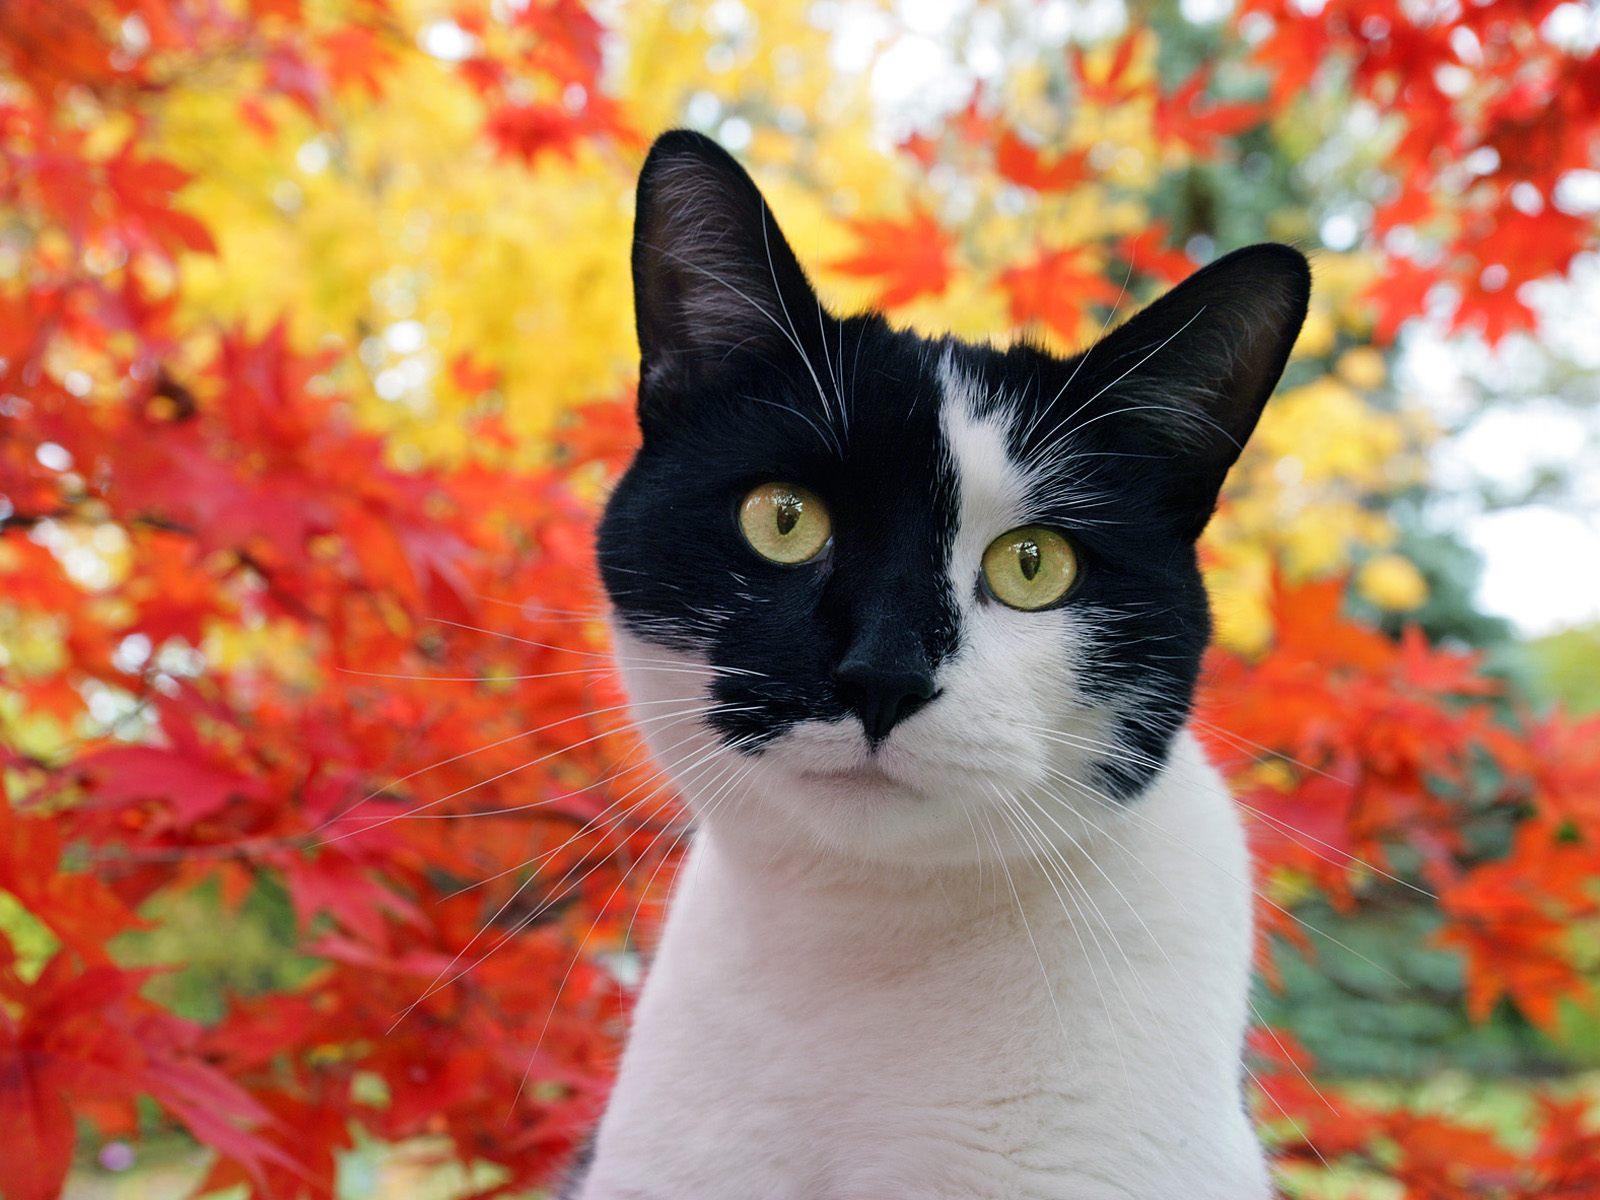 http://2.bp.blogspot.com/-zwYYUjO5cqc/TwgDoQDFuvI/AAAAAAAABKI/JTx3B76uDXA/s1600/Cat_1.jpg